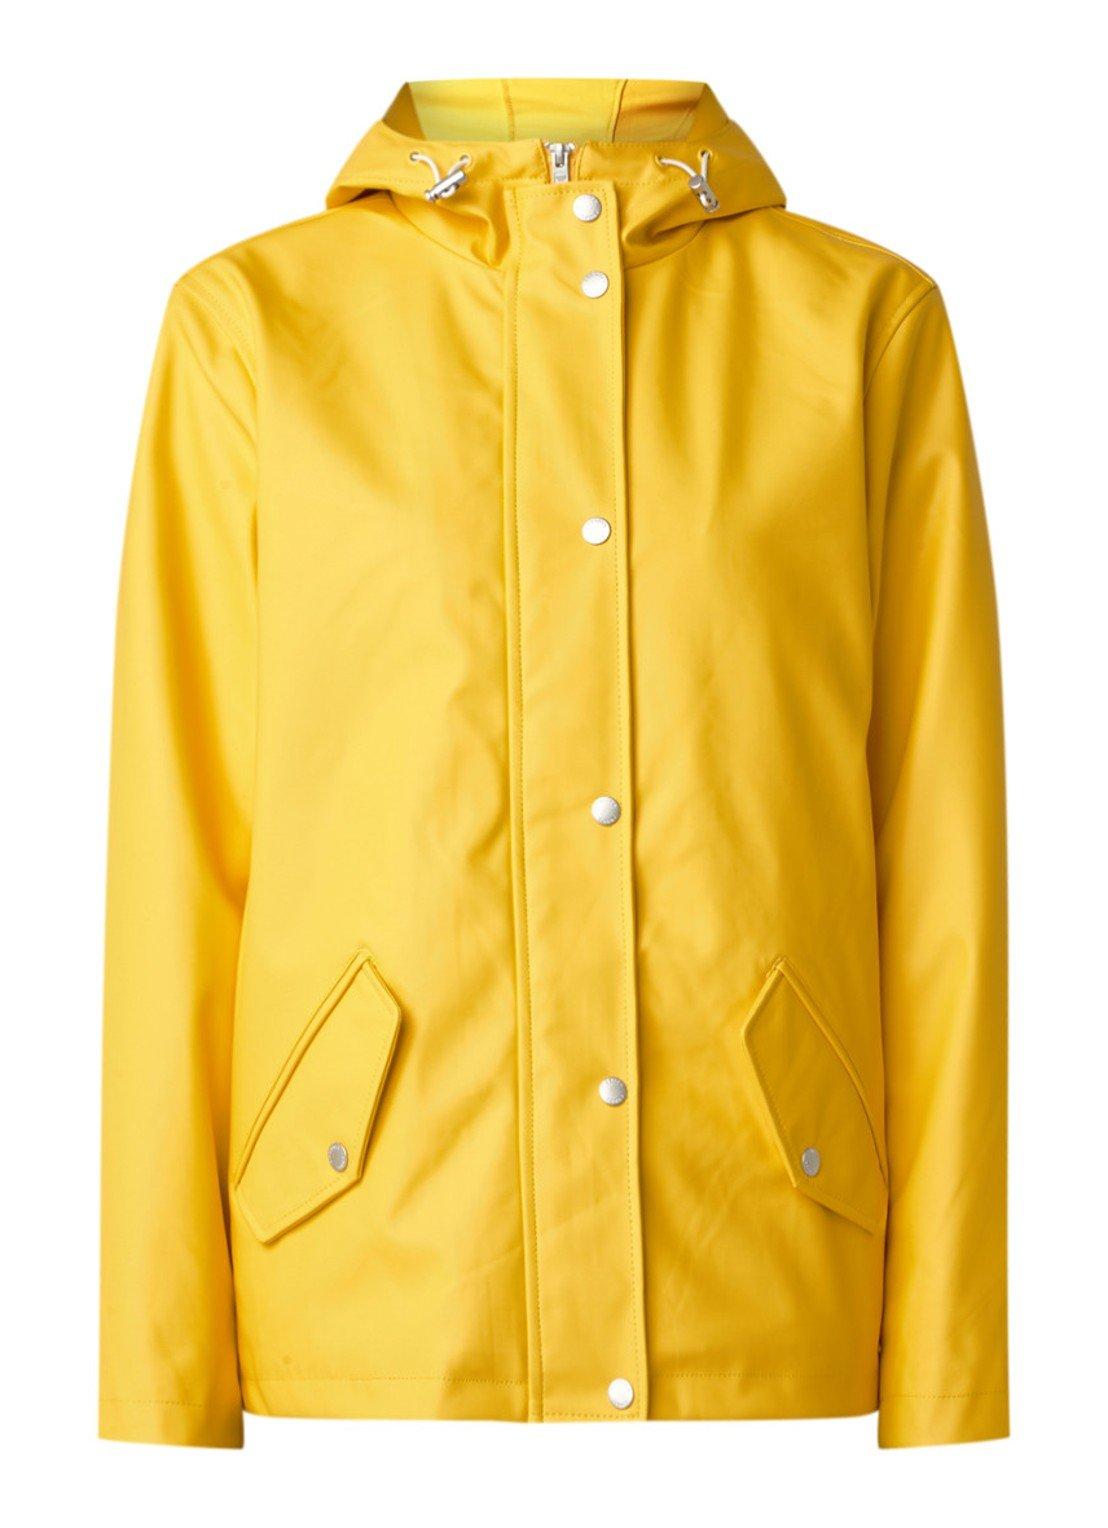 Janice raincoat with hood